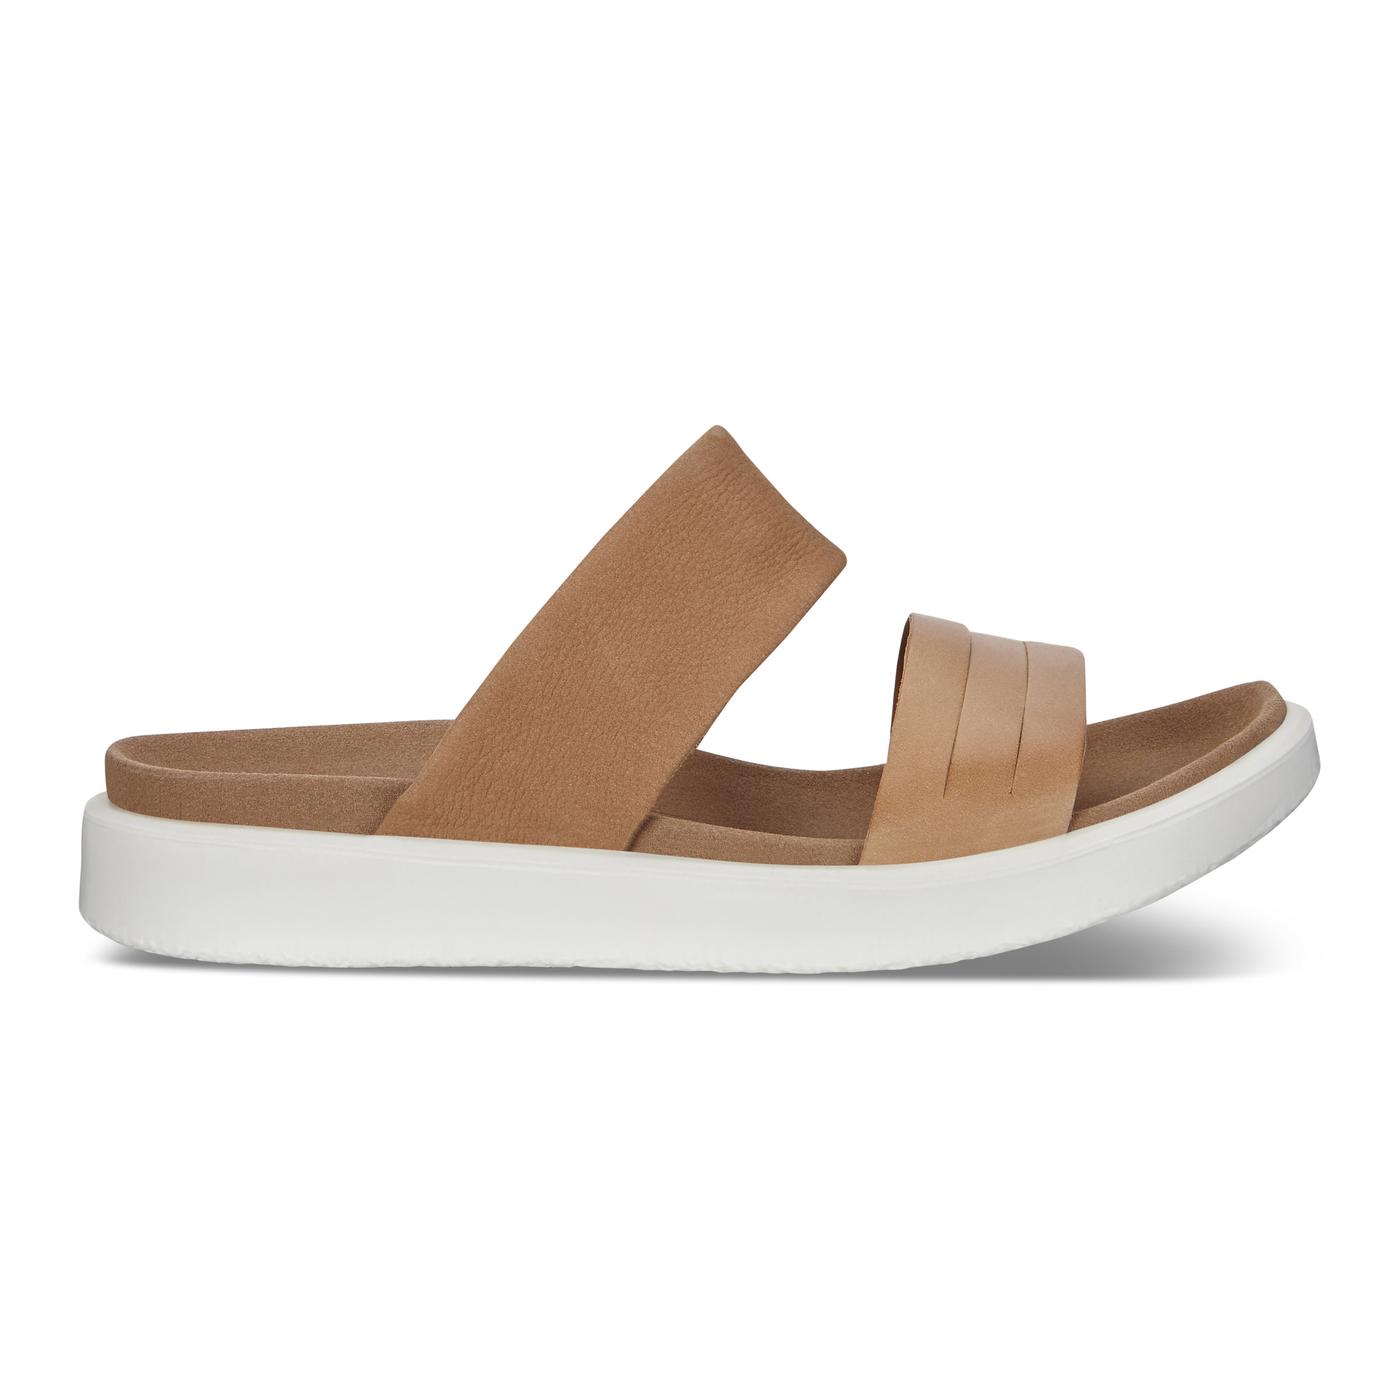 ECCO FLOWT Women's Flat Sandal